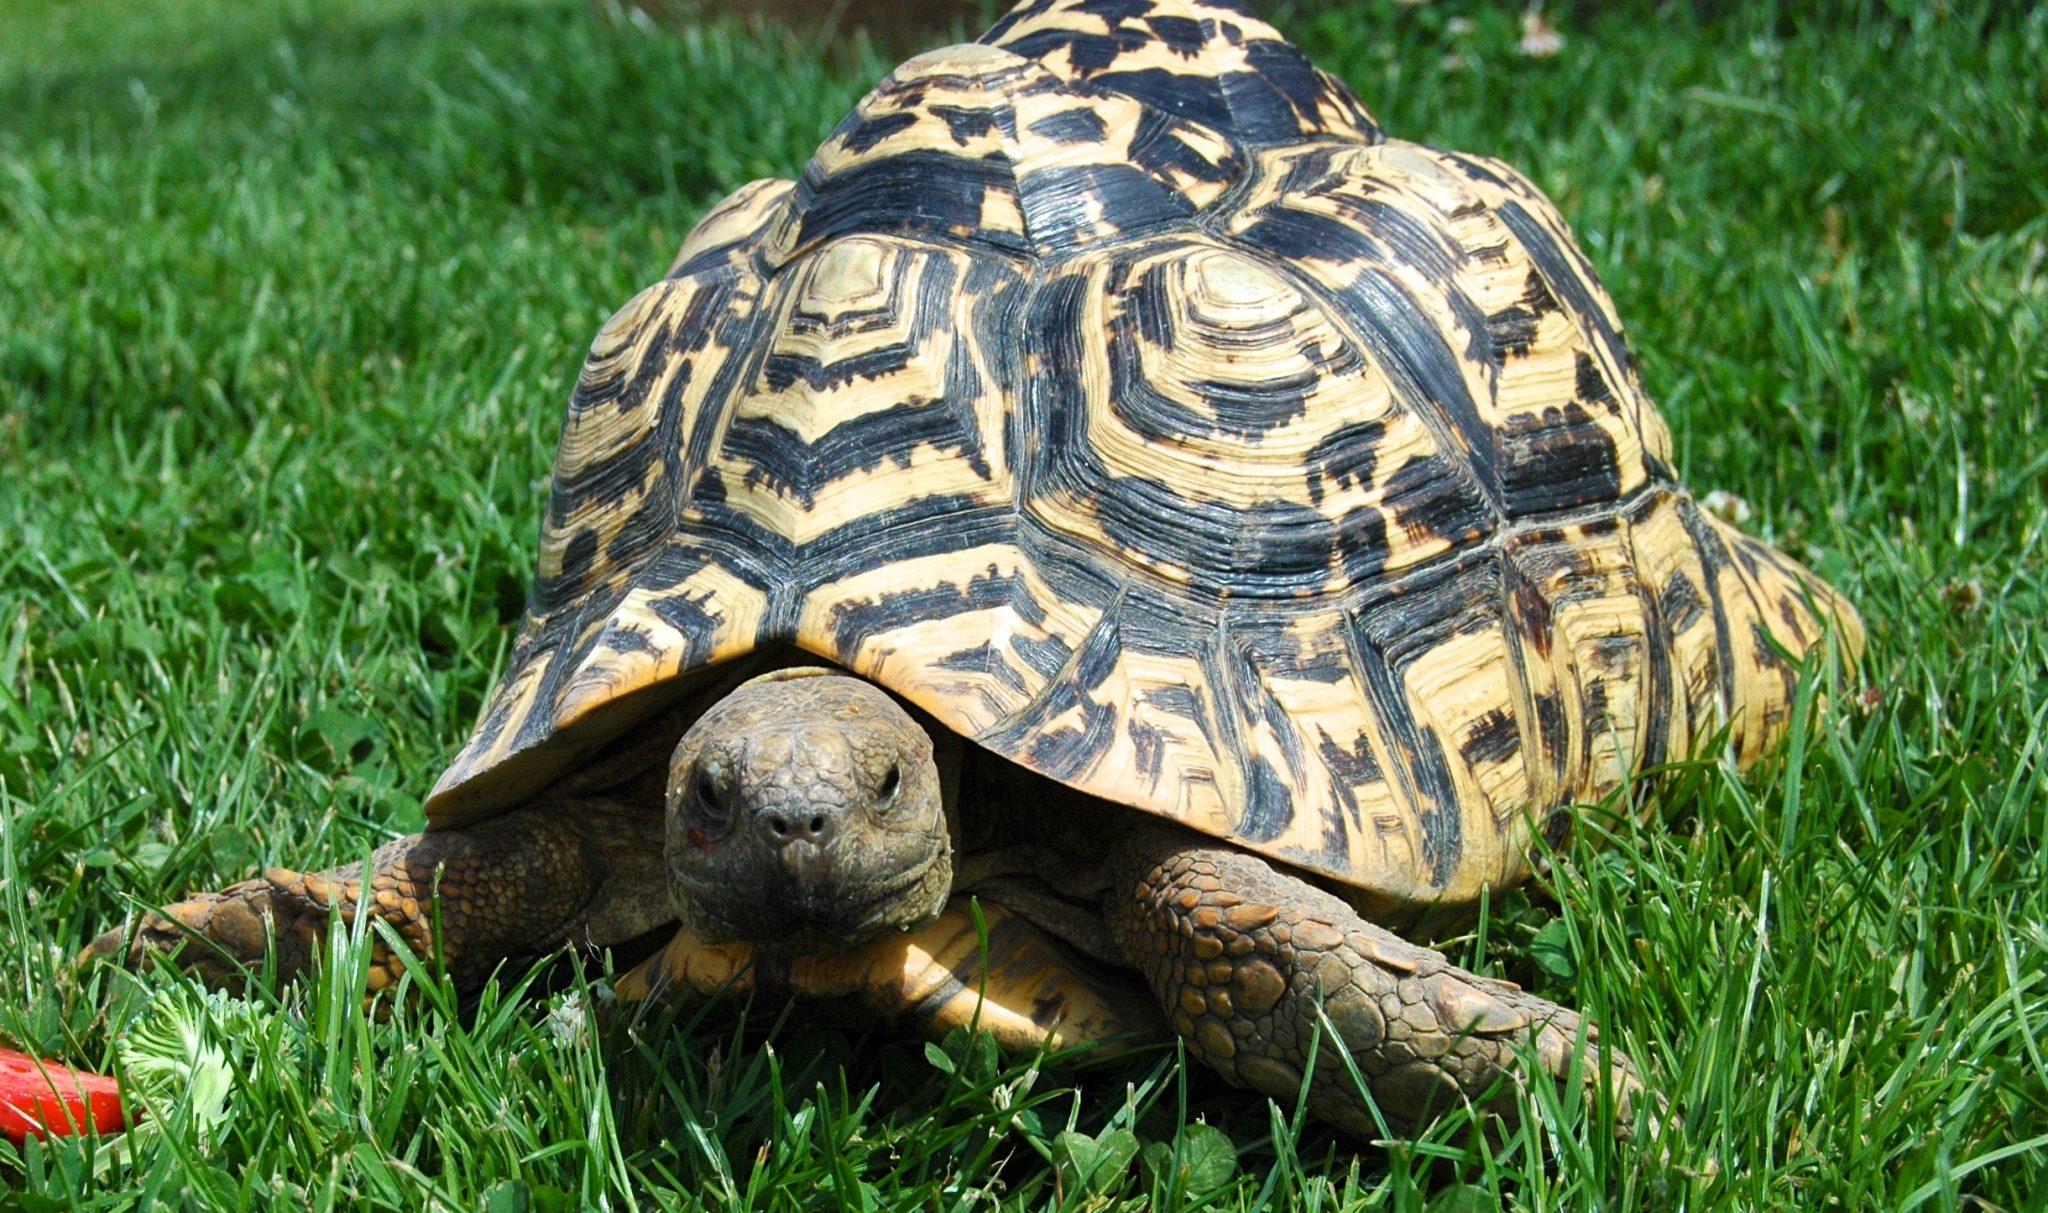 Fishers-Farm-Tortoise-Sybil